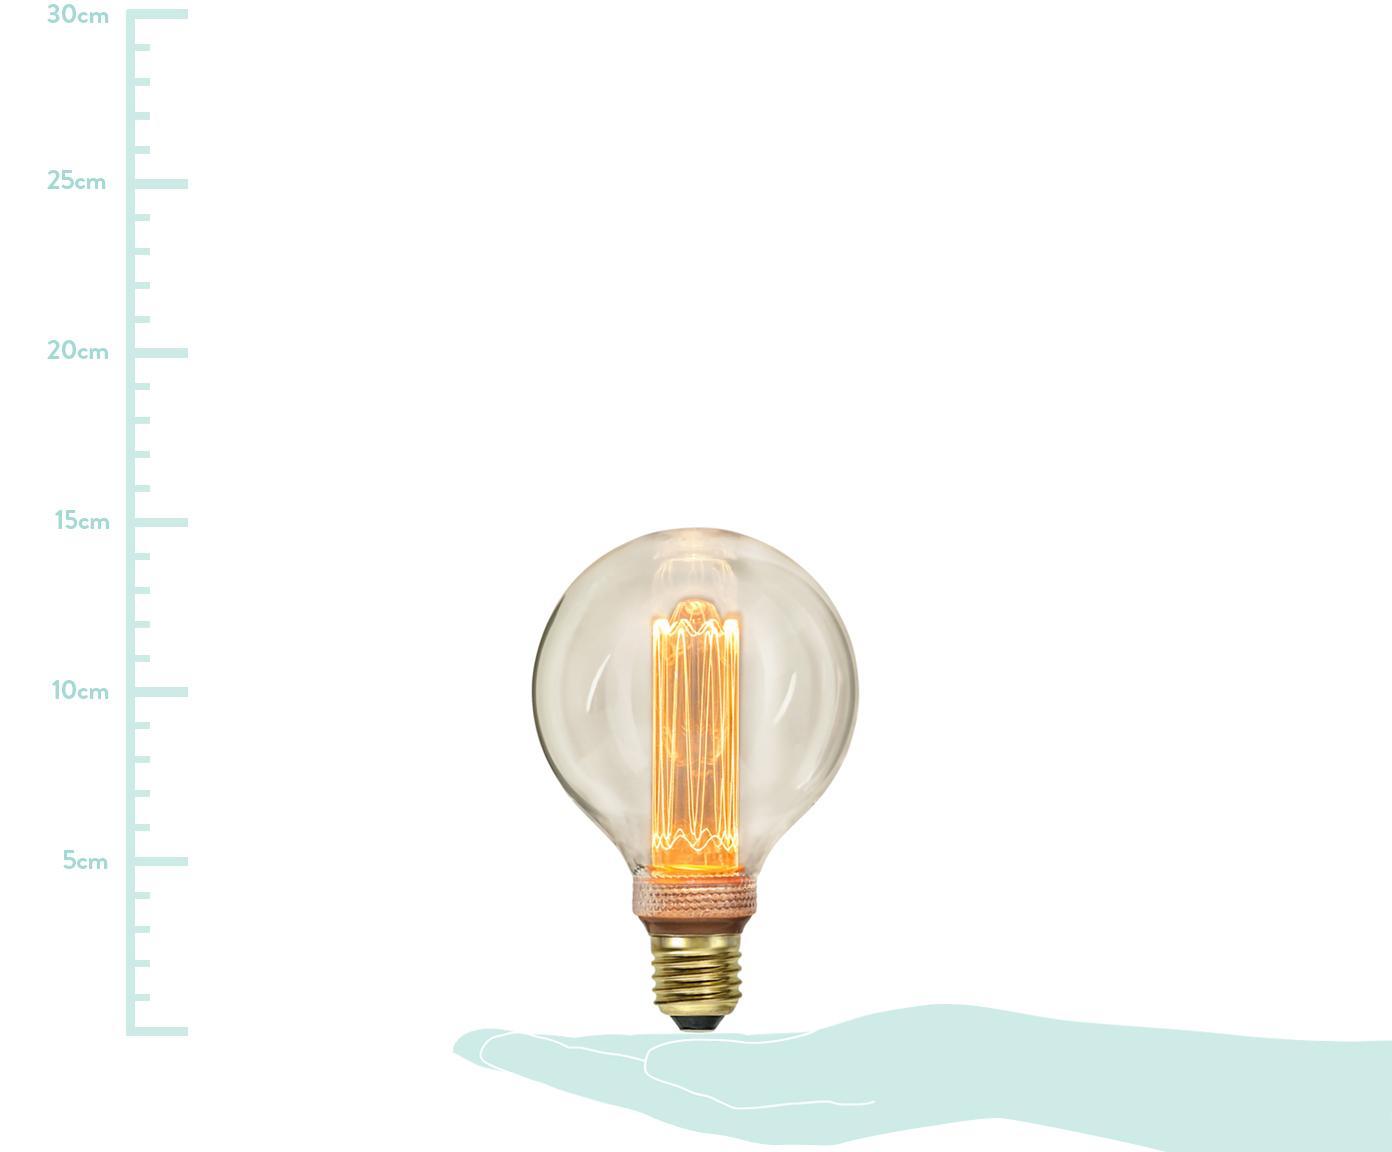 Dimmbares XL LED Leuchtmittel New Generation (E27/ 2.5W), Leuchtmittelschirm: Glas, Leuchtmittelfassung: Messing, Bernsteinfarben, Ø 10 x H 15 cm